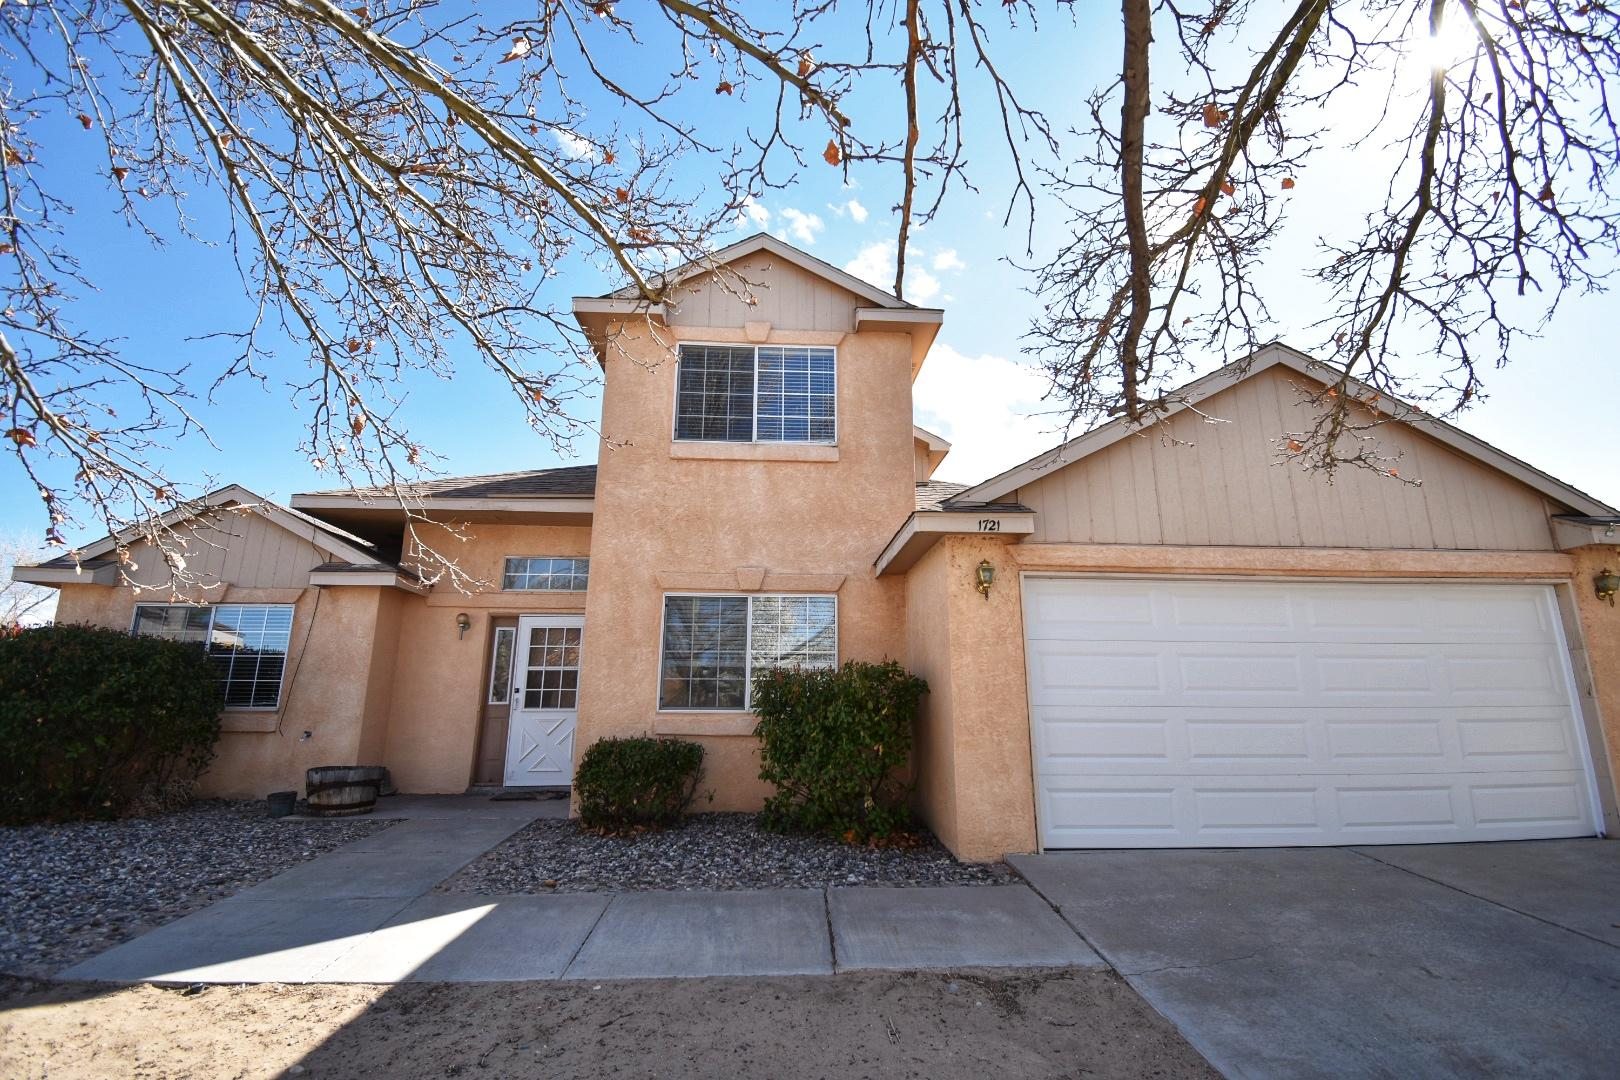 1721 Blueberry Drive, Rio Rancho NM 87144